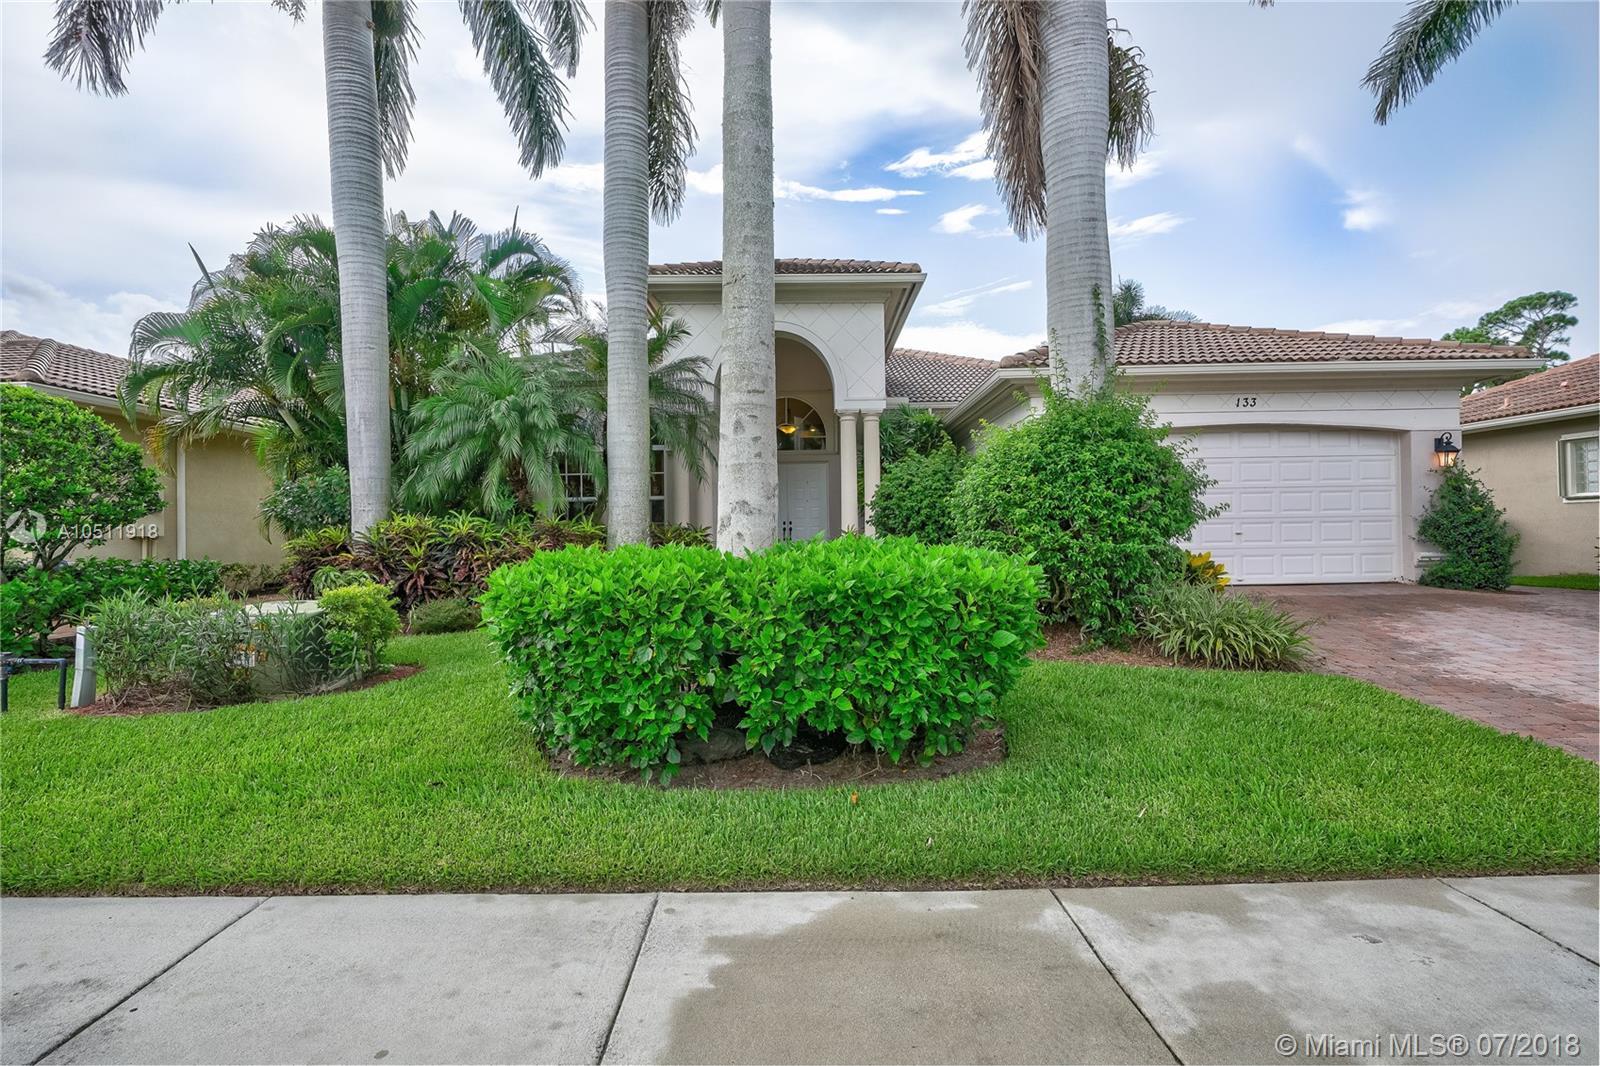 Property for sale at 133 Abondance Dr, Palm Beach Gardens,  Florida 33410